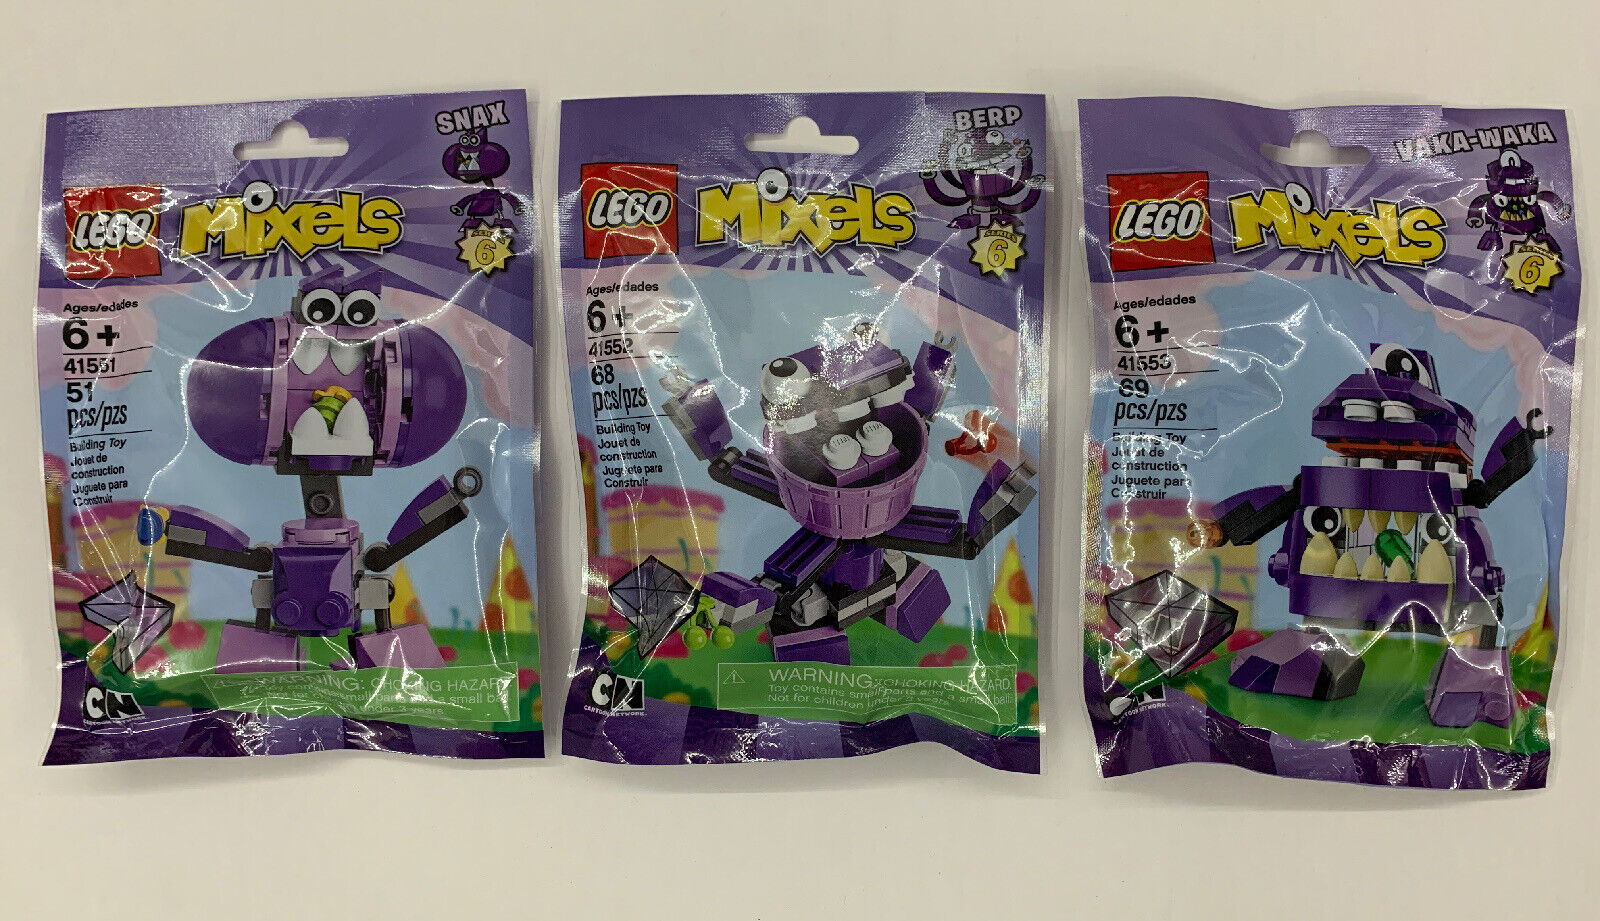 Retirot LEGO Mixels Series 6 41551 Snax 41552 Berp 41553 Vaka-Waka New SEALED